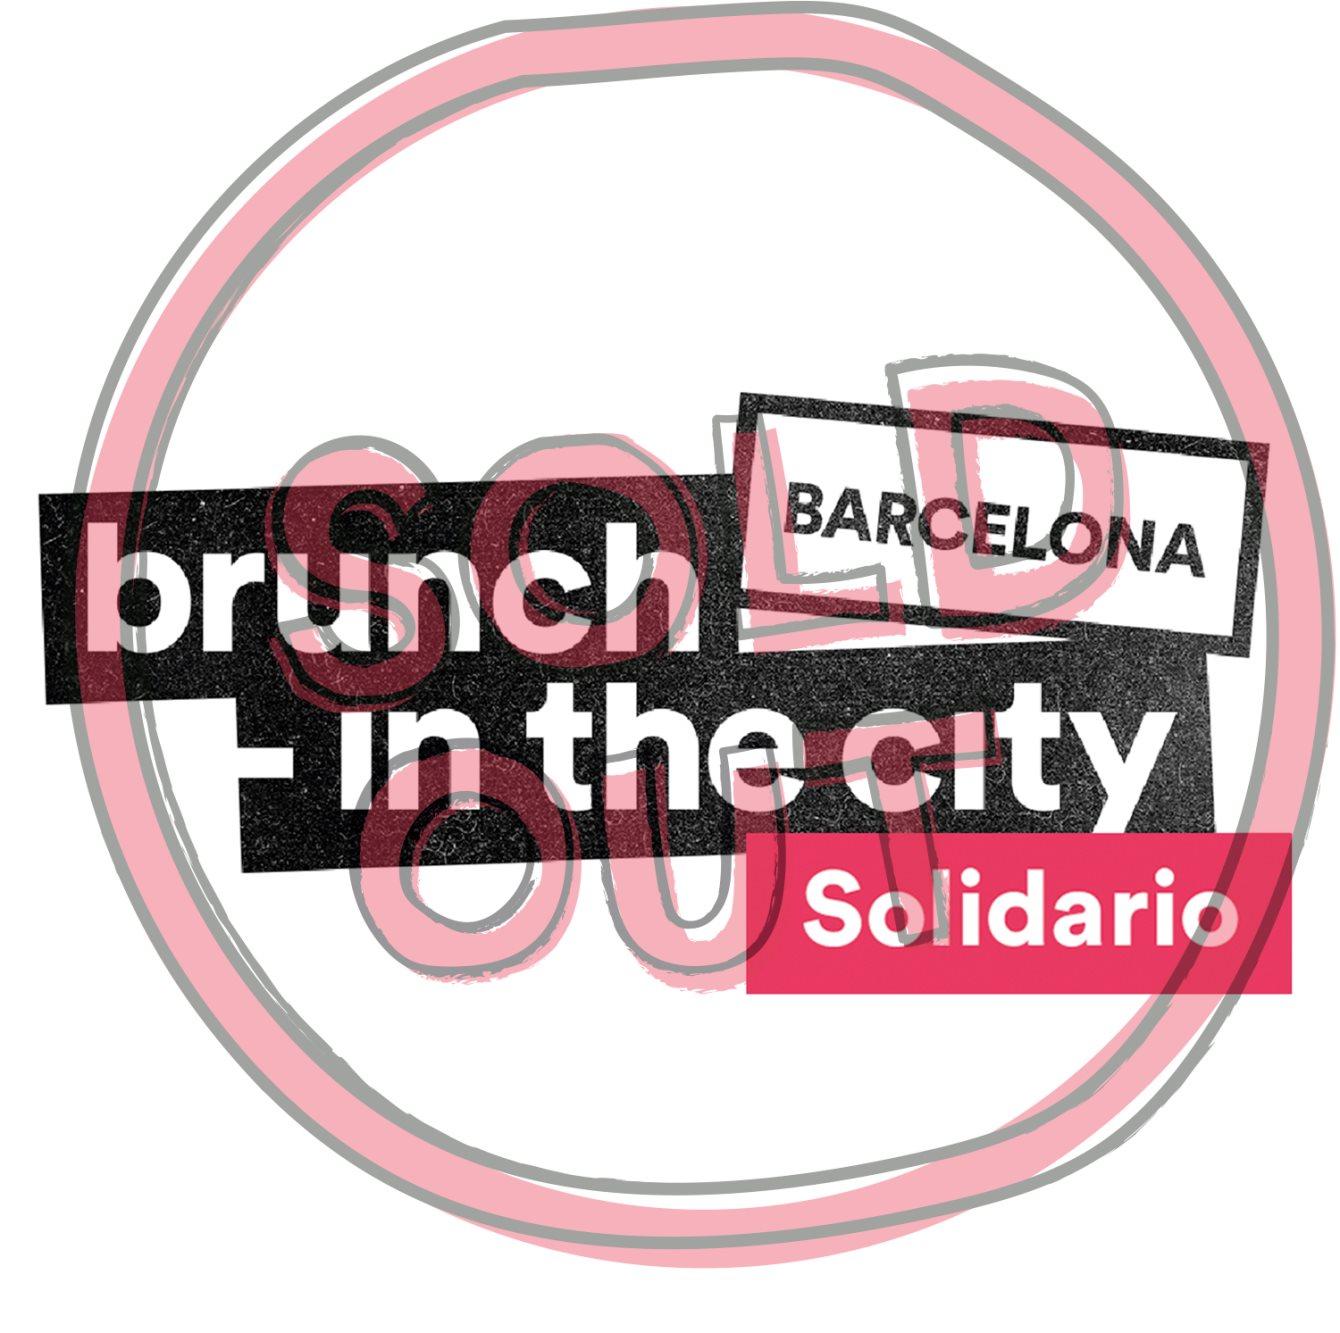 Brunch -In the City Solidario - Flyer front